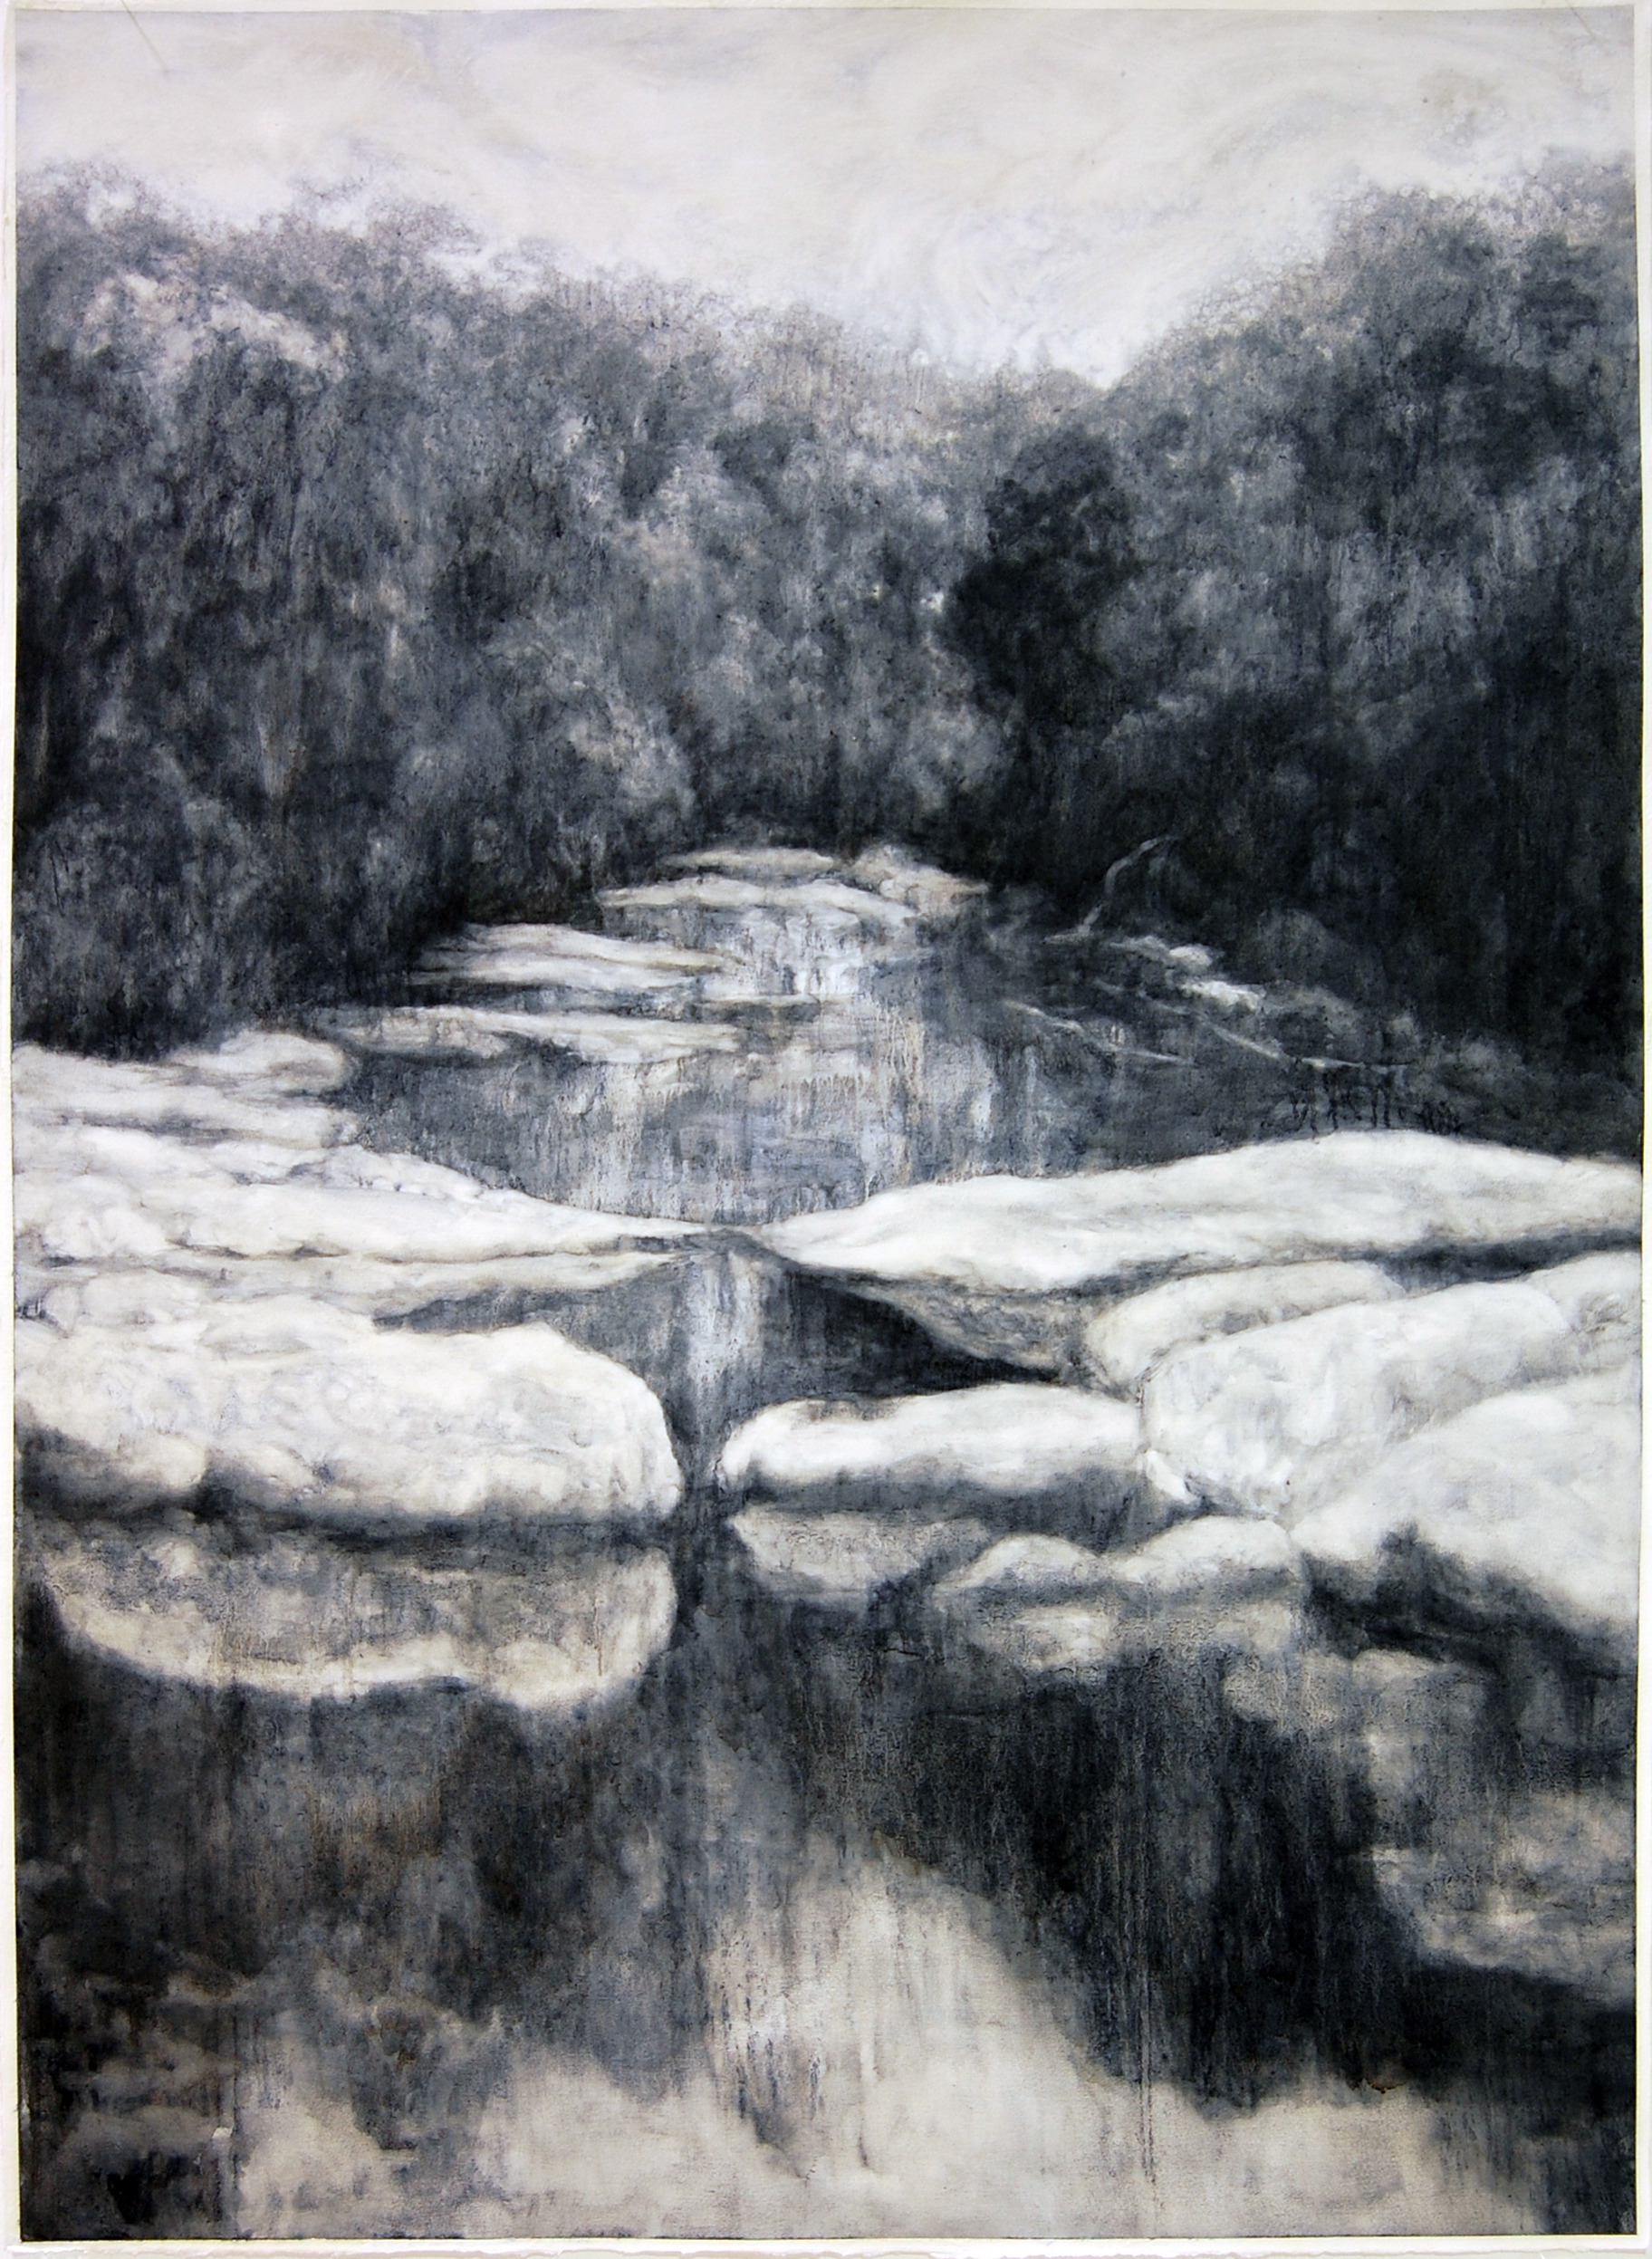 Frankland, 2017, Oil on paper, 105 x 85cm